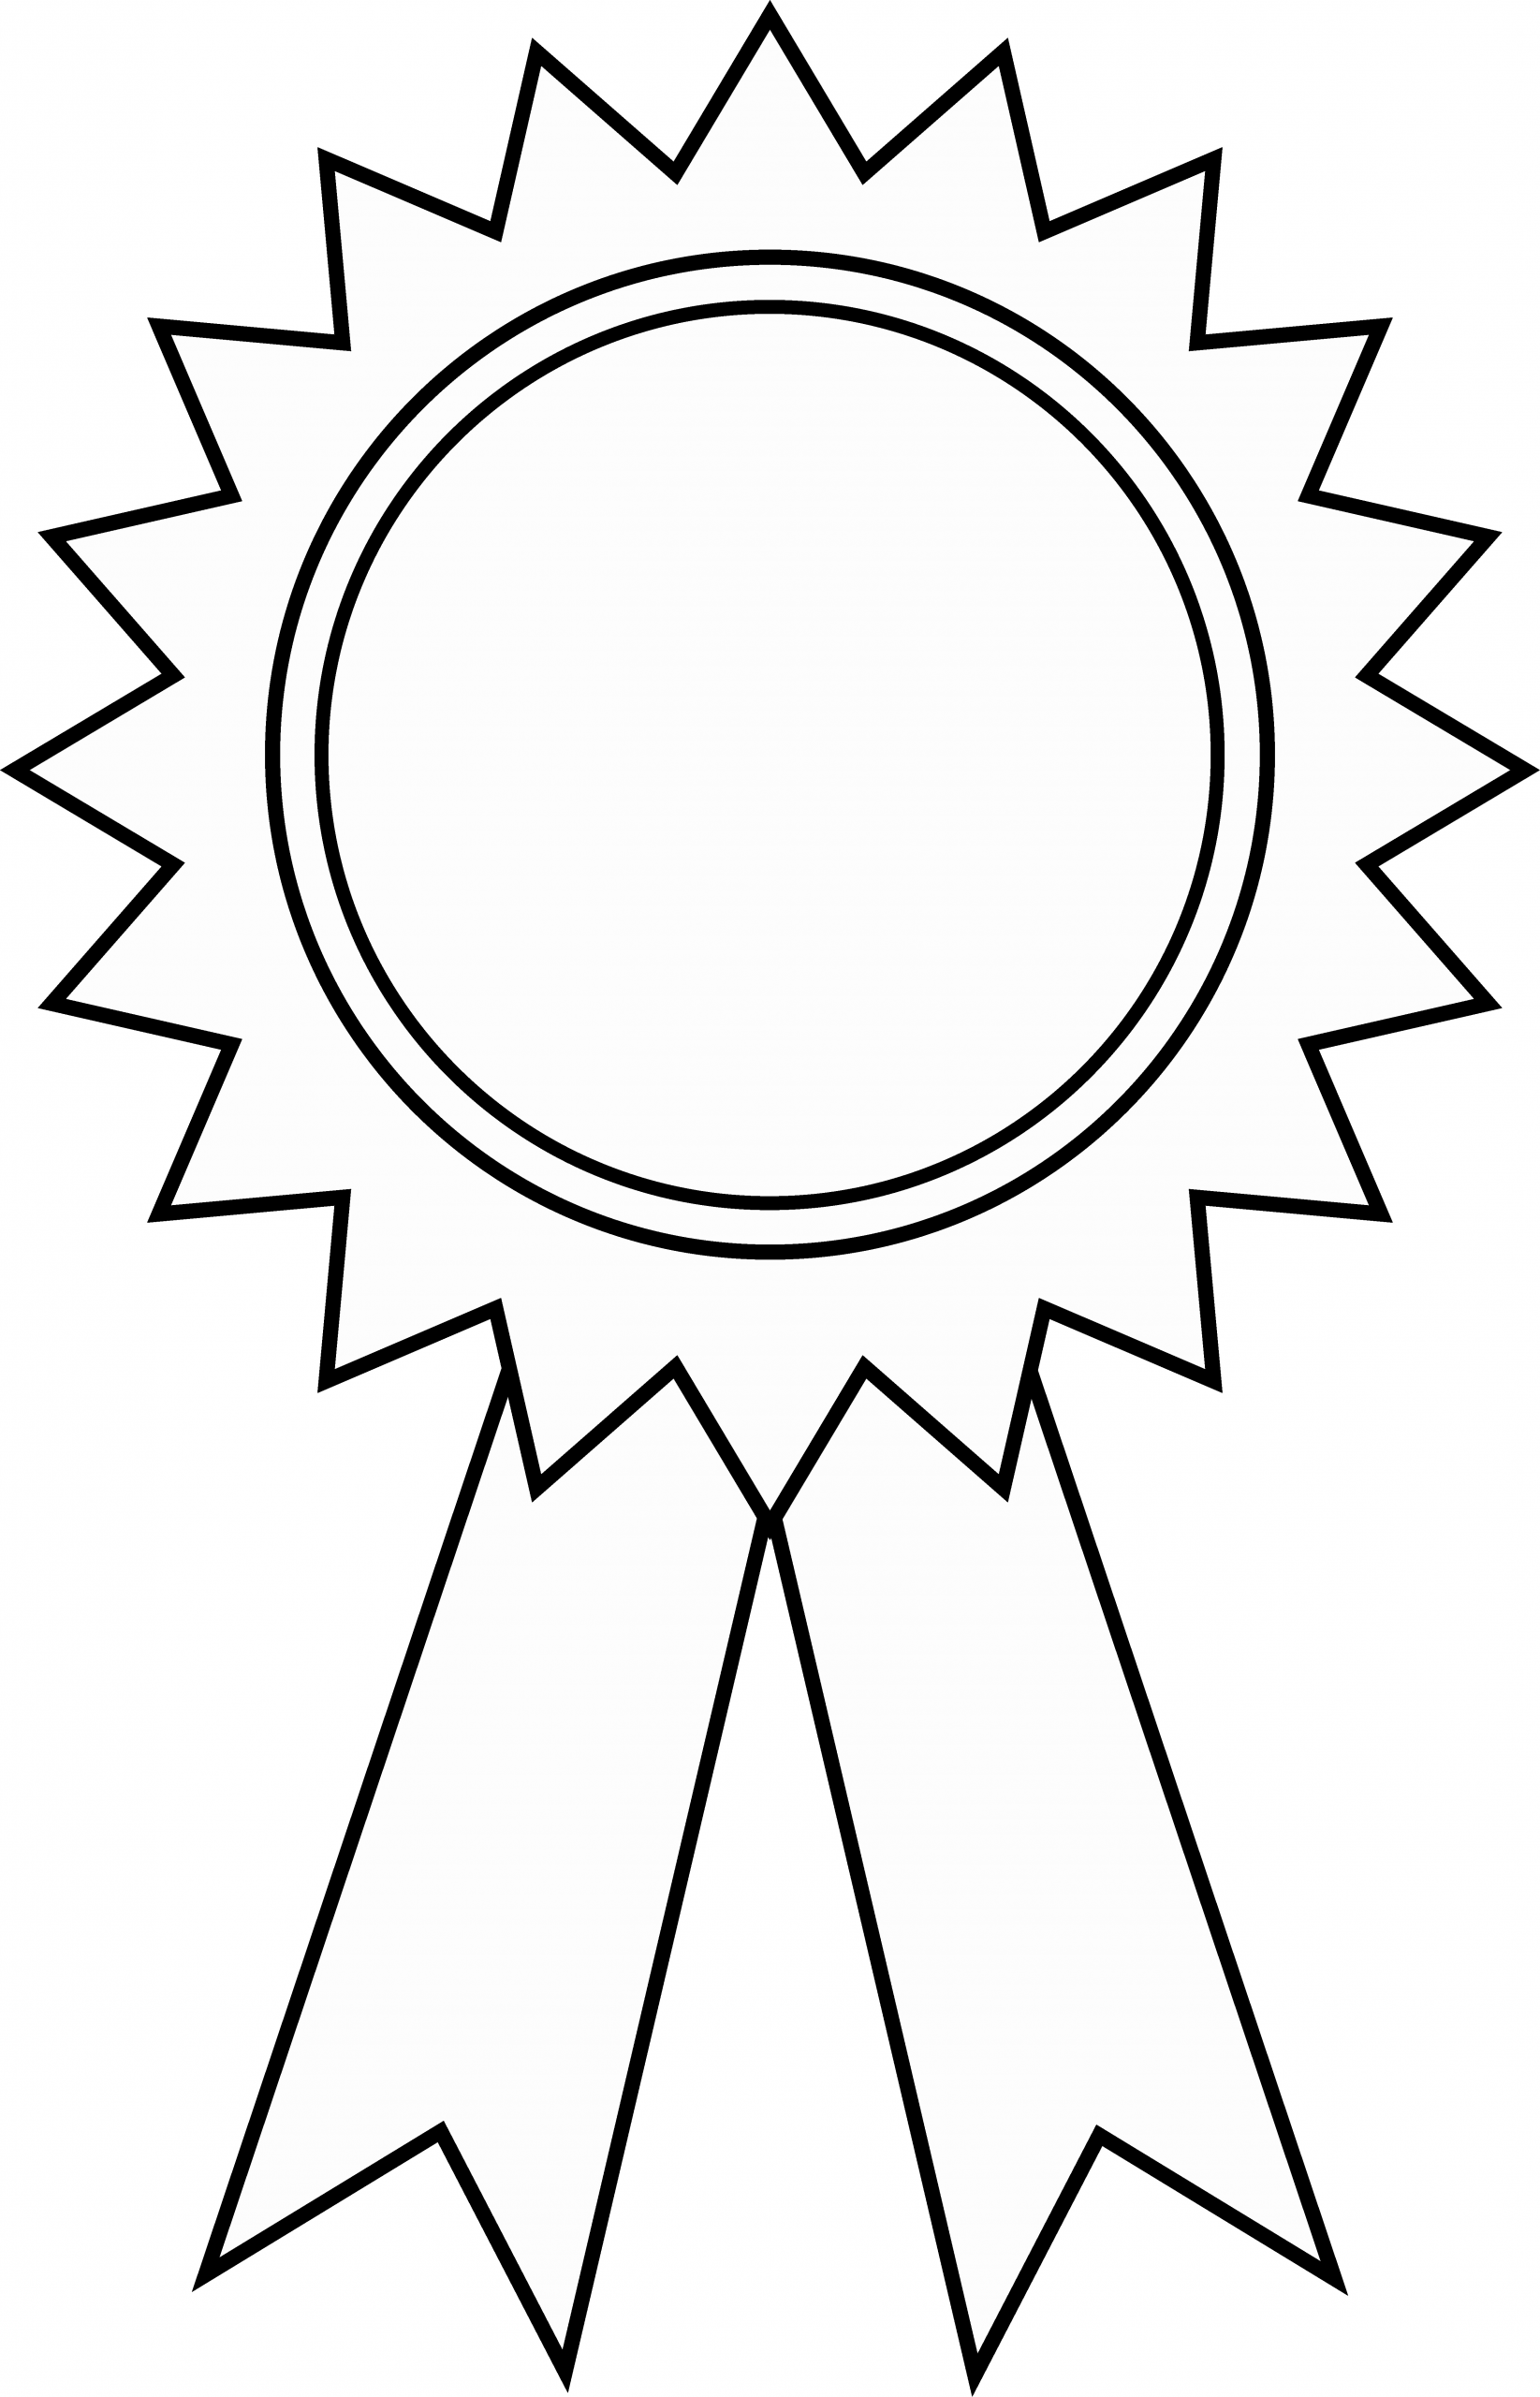 Printable 1st 2nd 3rd Place Ribbons Lovely Award Ribbon Printable